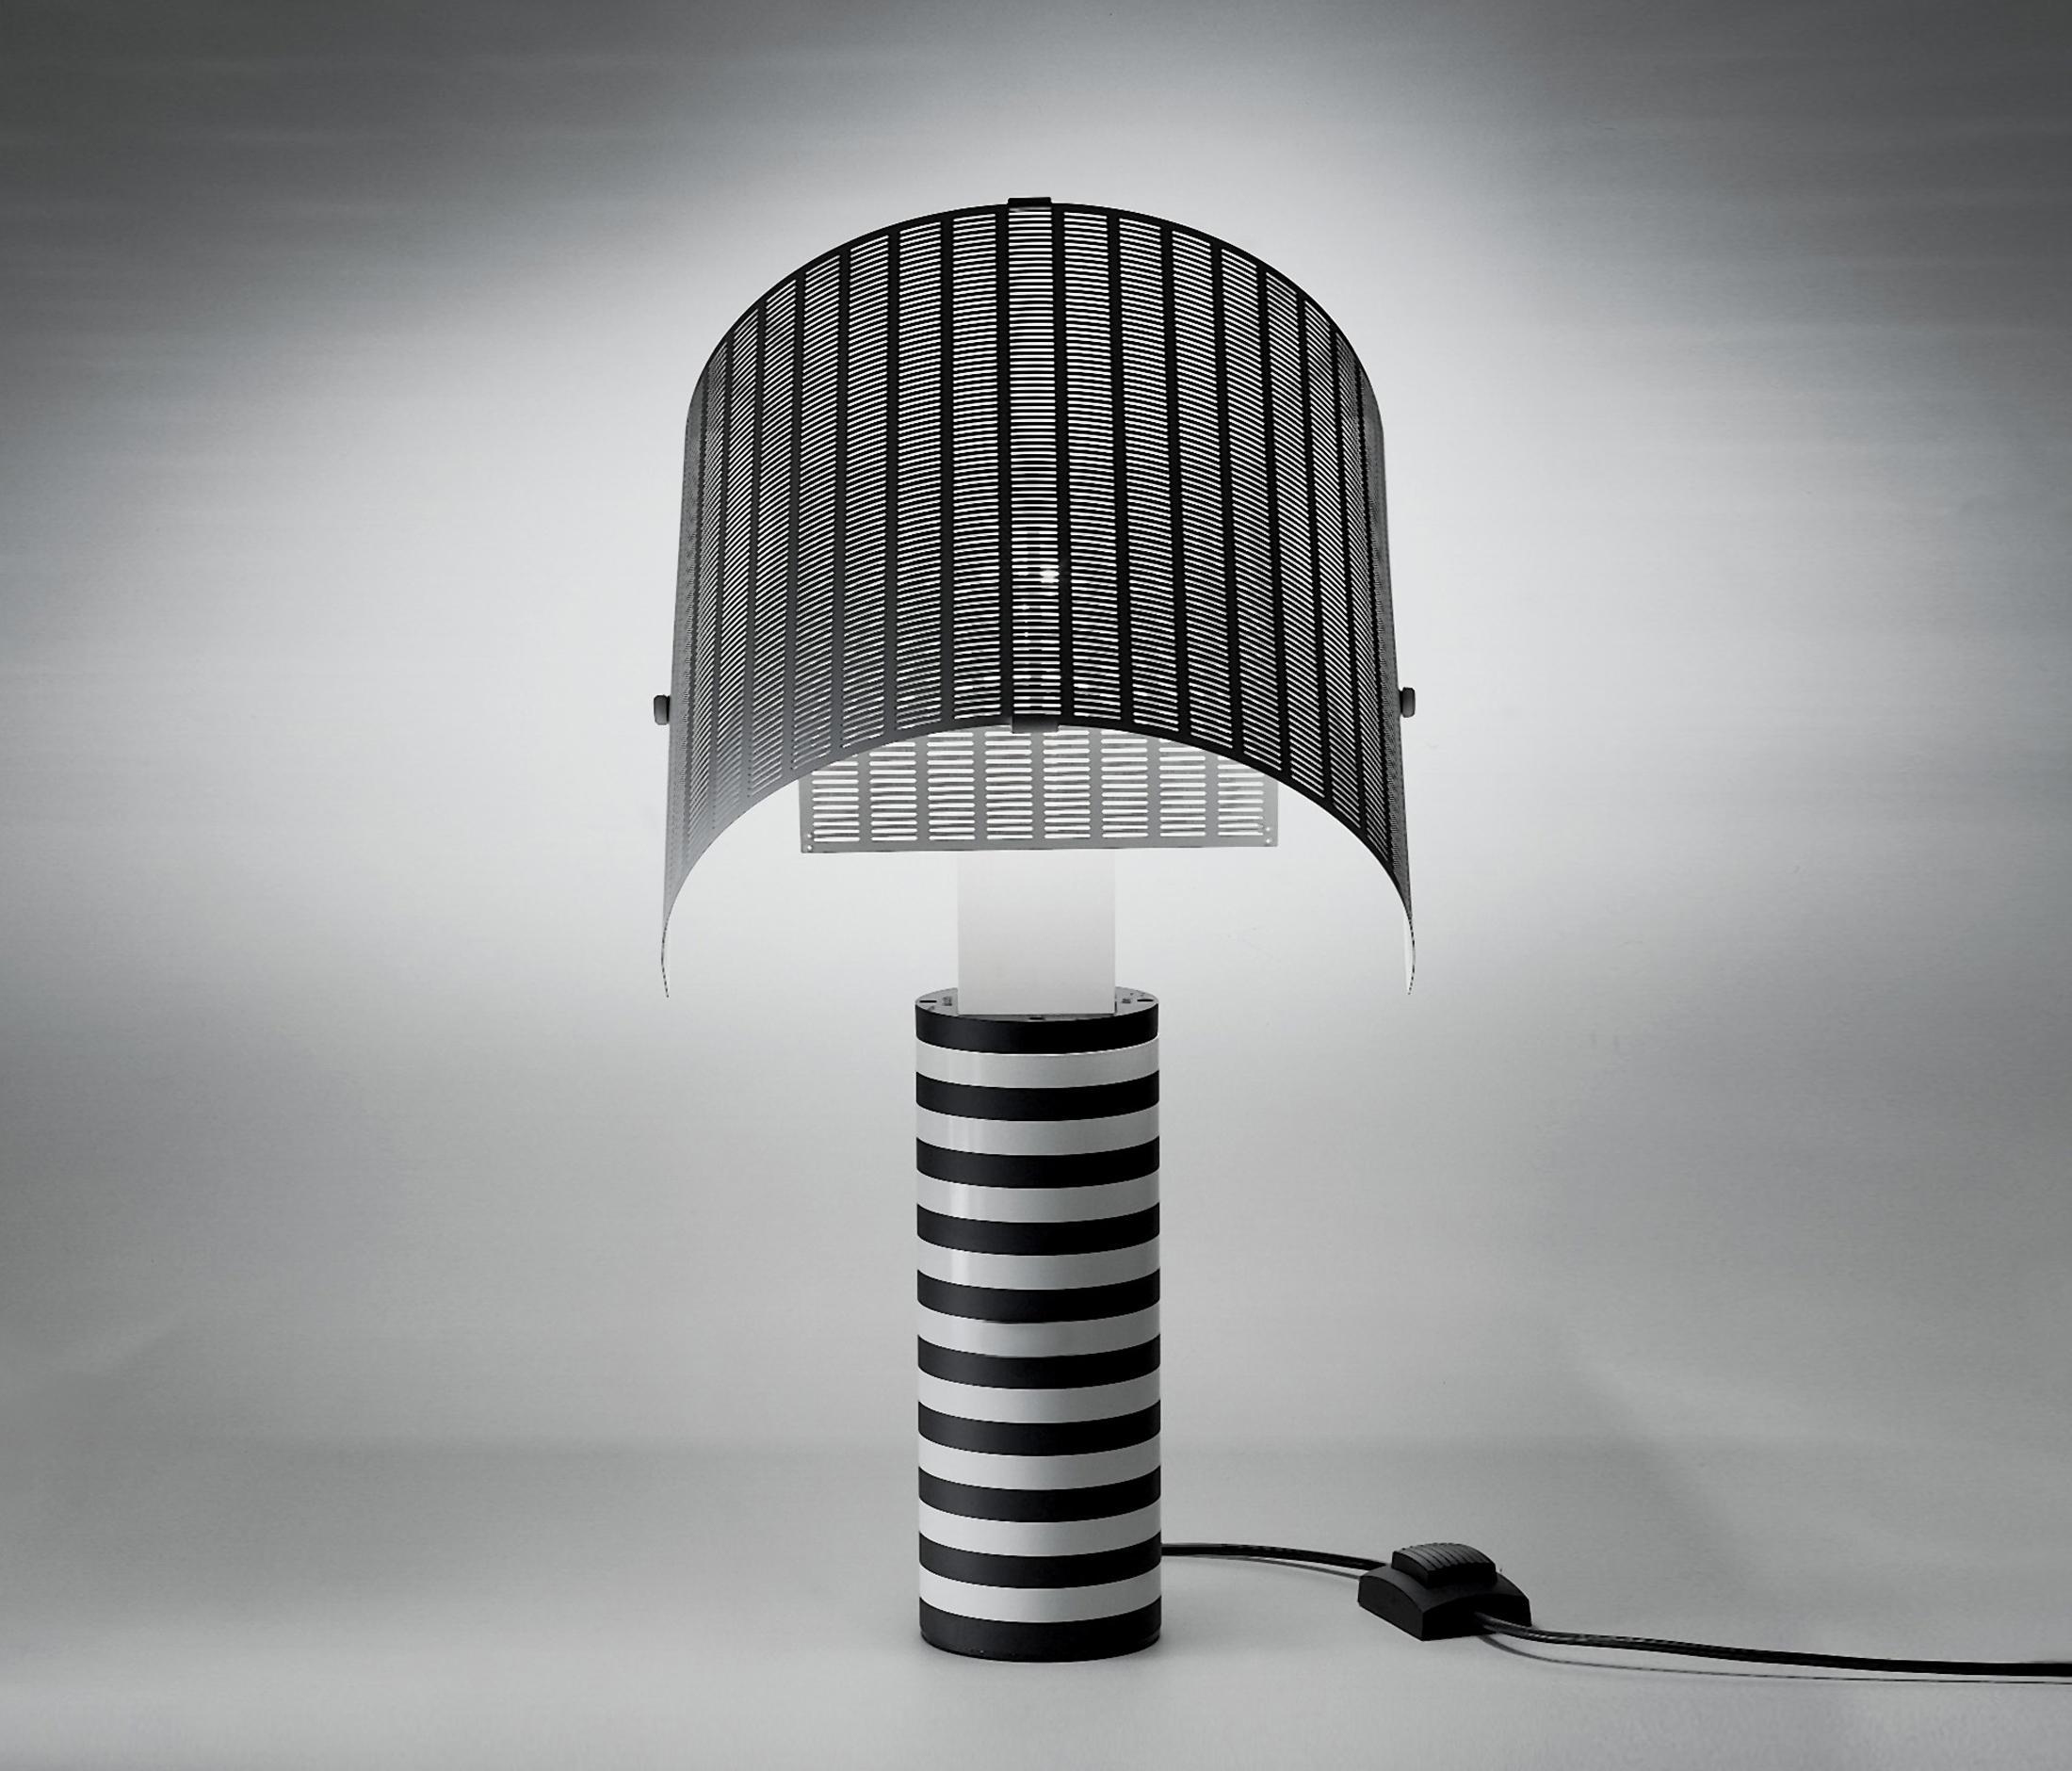 Shogun lampade da tavolo illuminazione generale artemide - Artemide lampade da tavolo prezzi ...